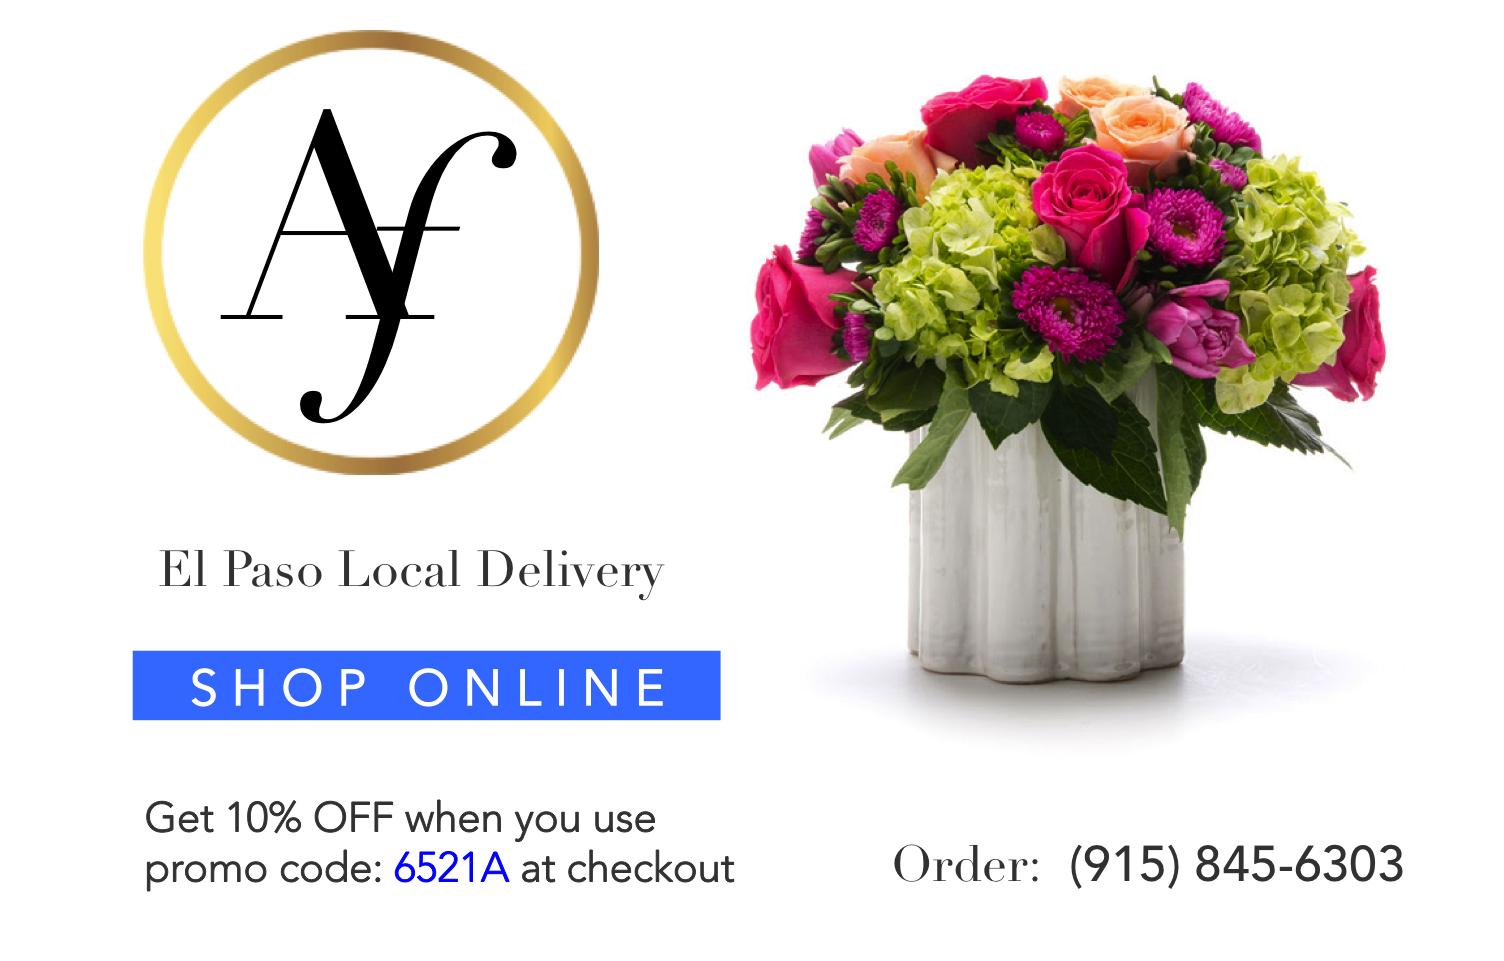 79912angies-floral-designs-el-paso-florist-79912.png